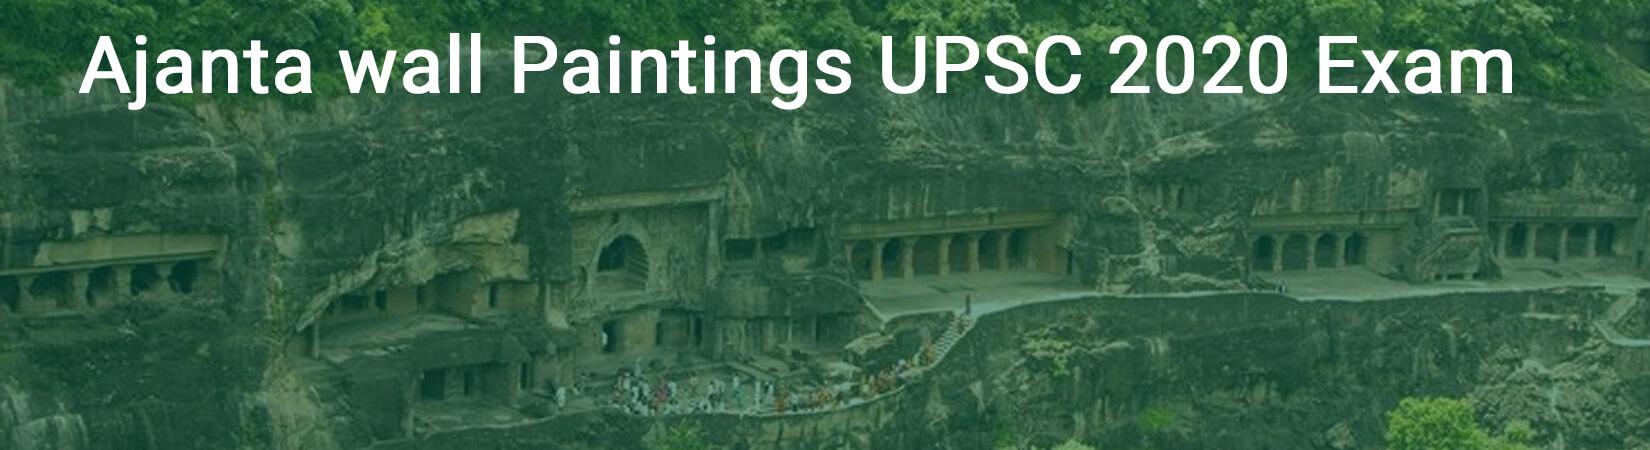 Ajanta wall Paintings - UPSC 2020 Exam